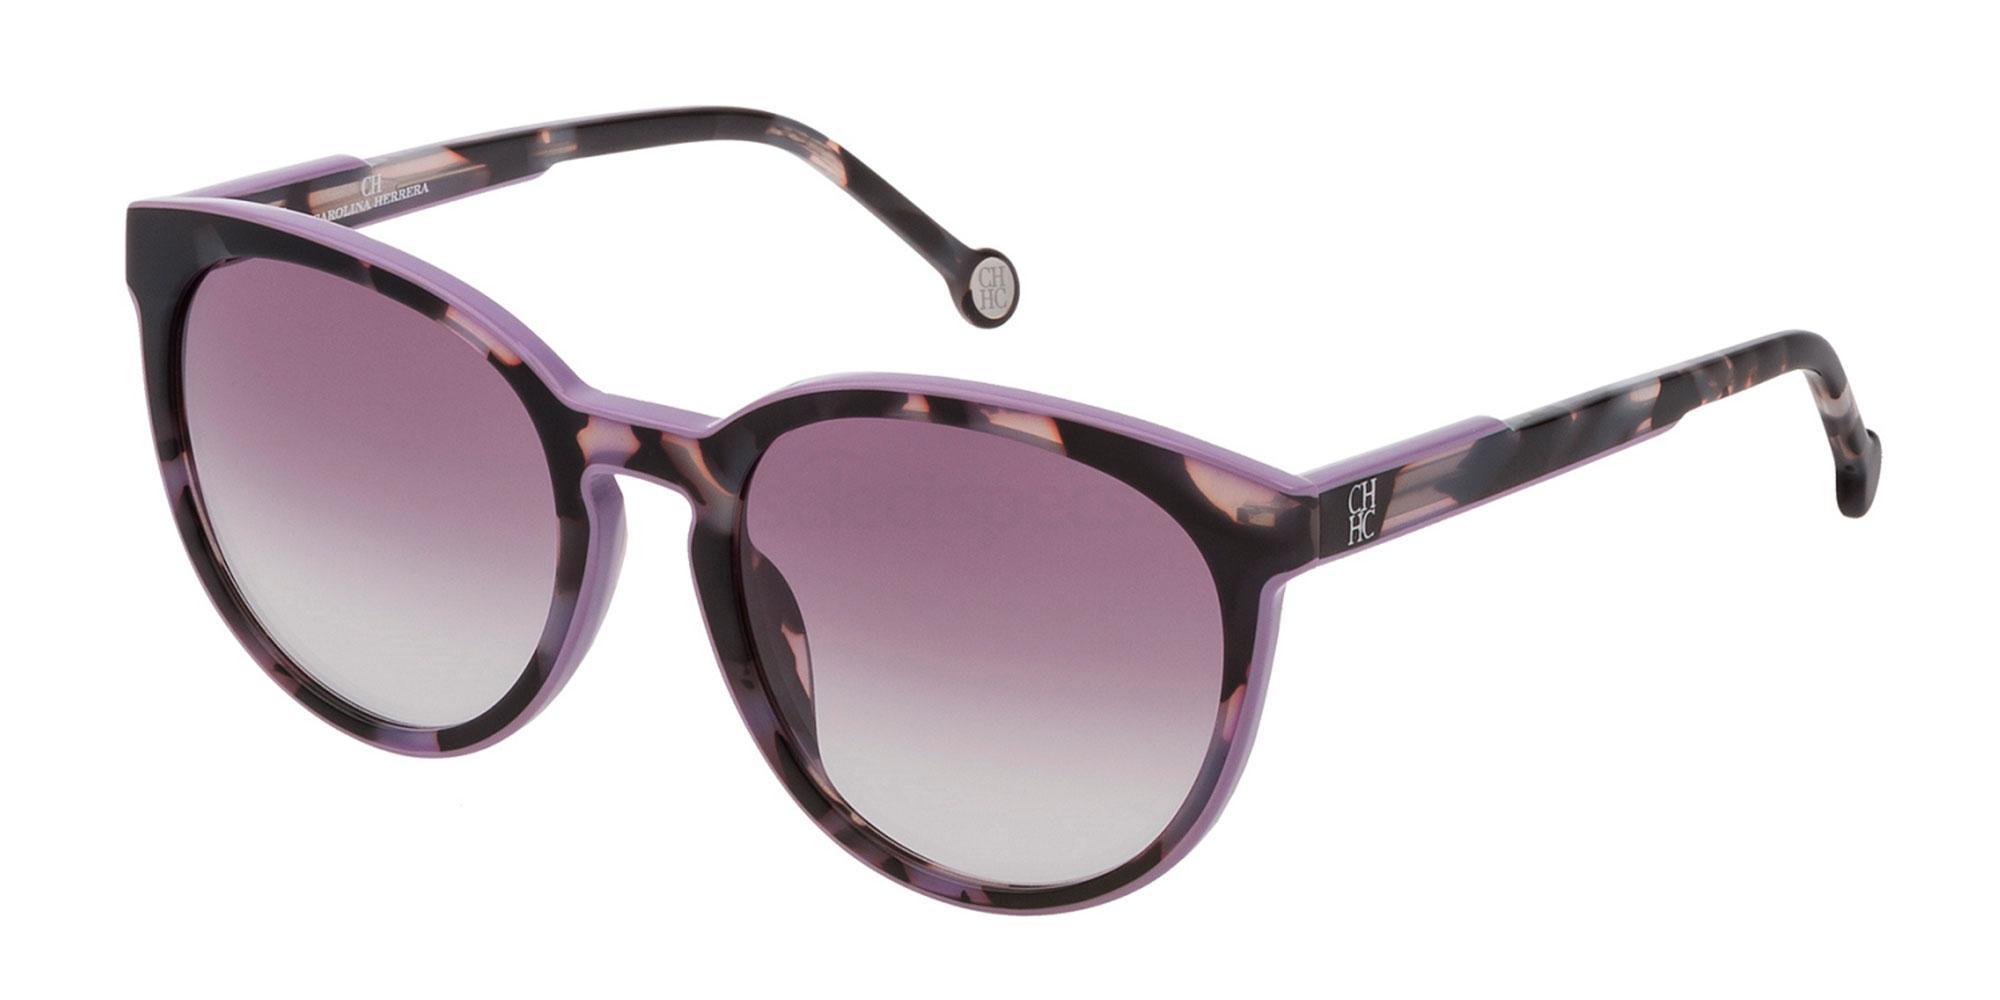 09QA SHE793 Sunglasses, CH Carolina Herrera